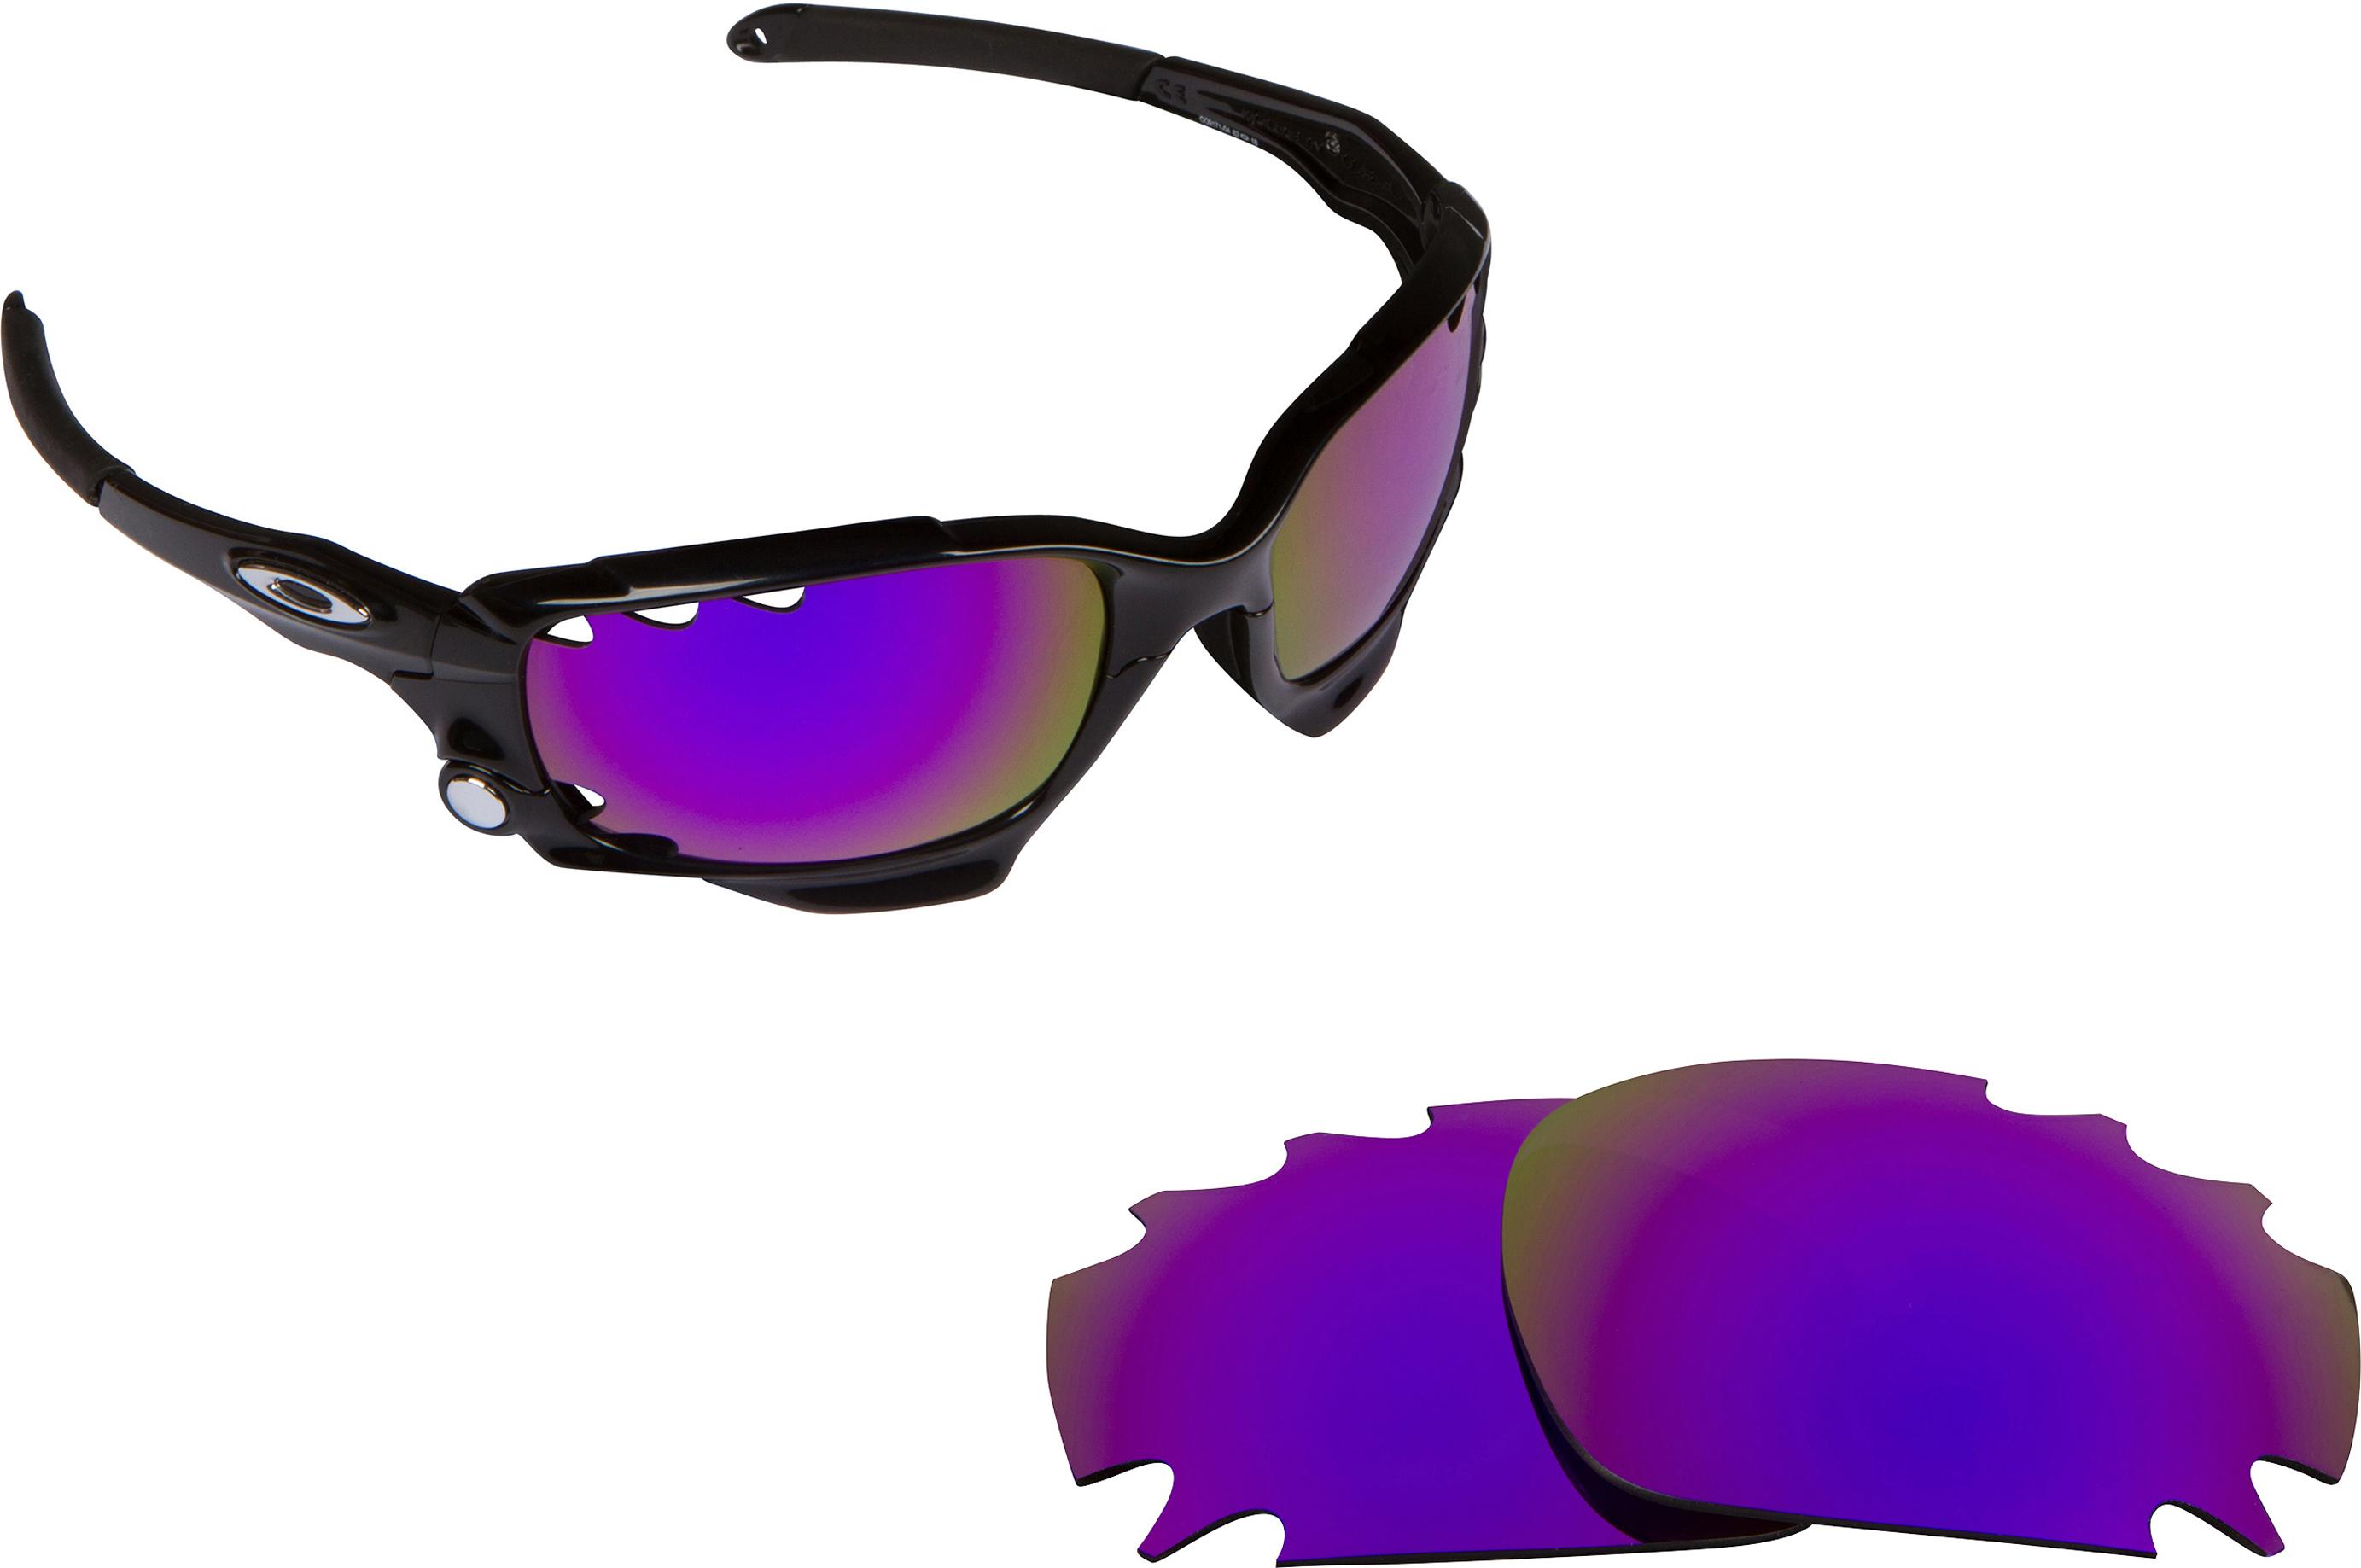 5d509dc375361 Buy Vented Racing Jacket Replacement Lenses Purple by Seek Fits ...